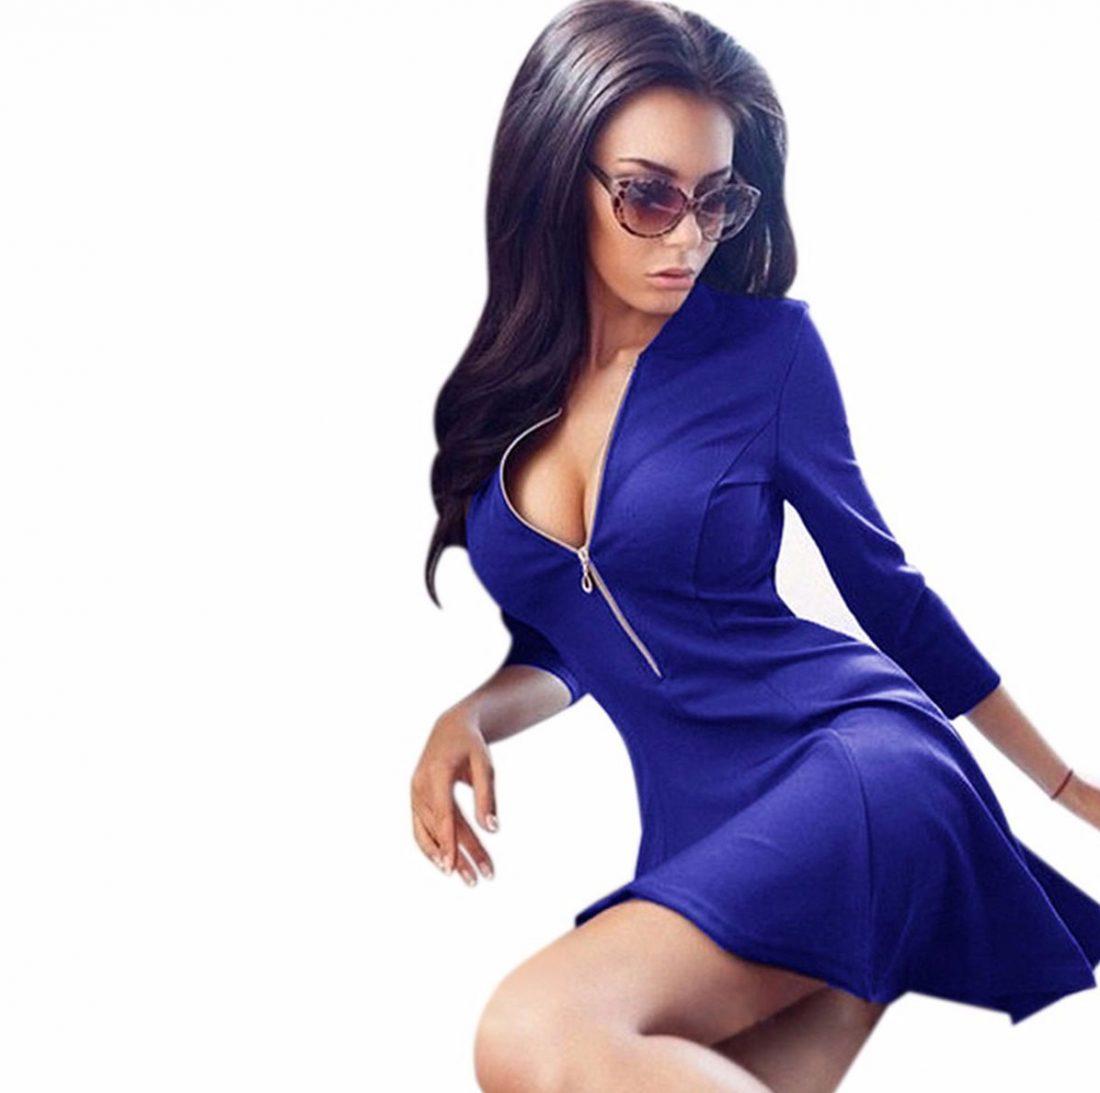 M0184 blue1 Leisure Dresses maureens.com boutique